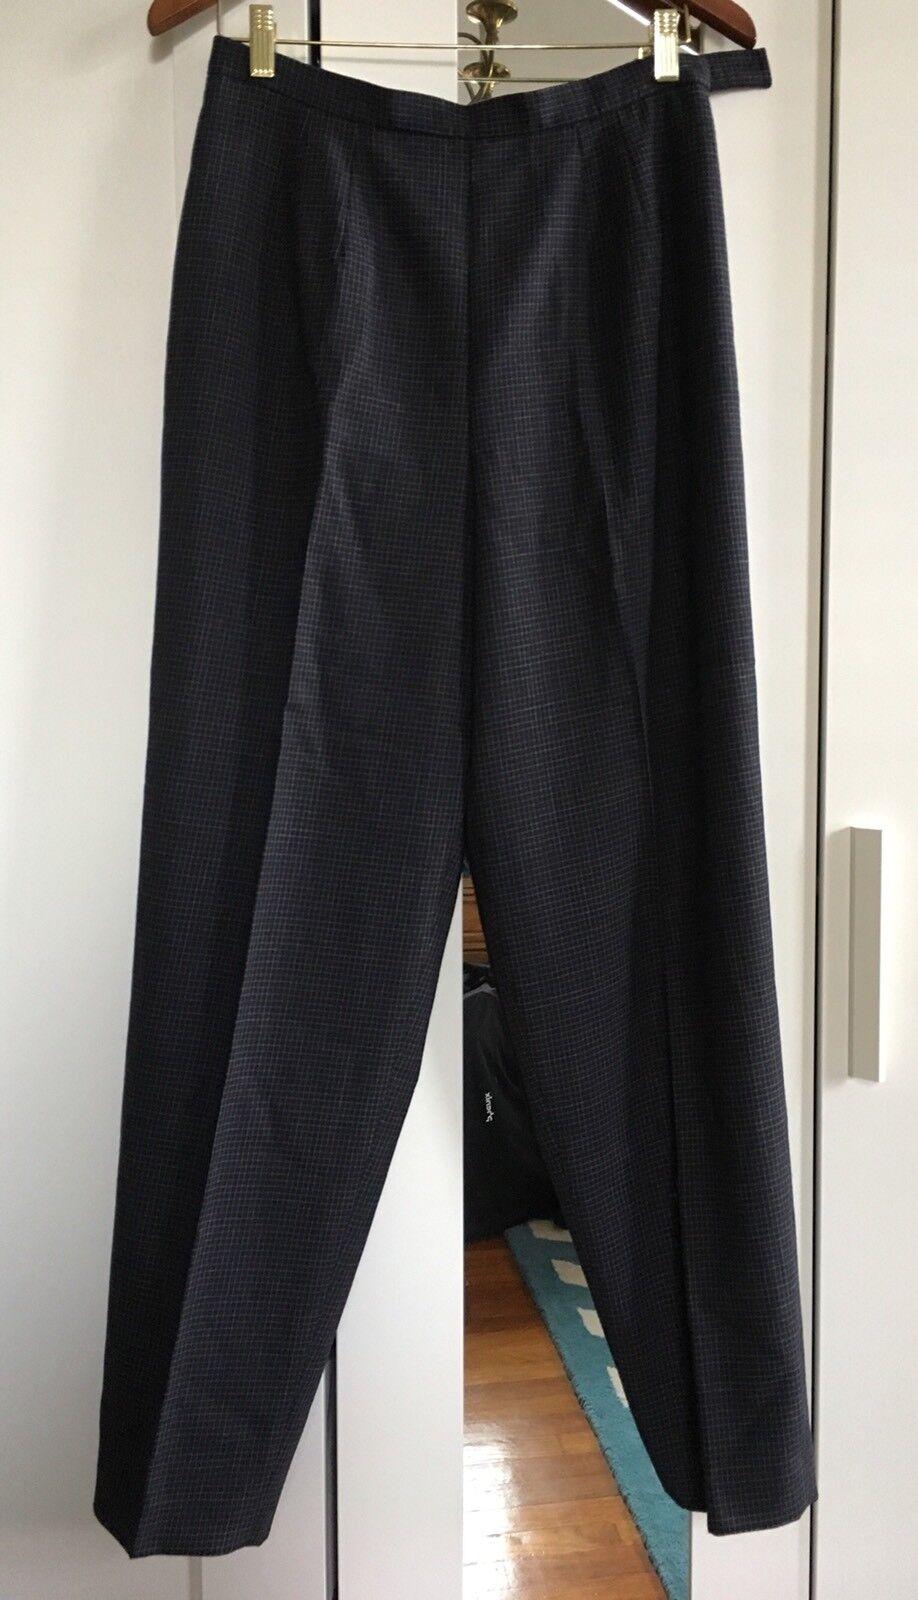 New Talbots Women Pants Size 12, 100% Wool